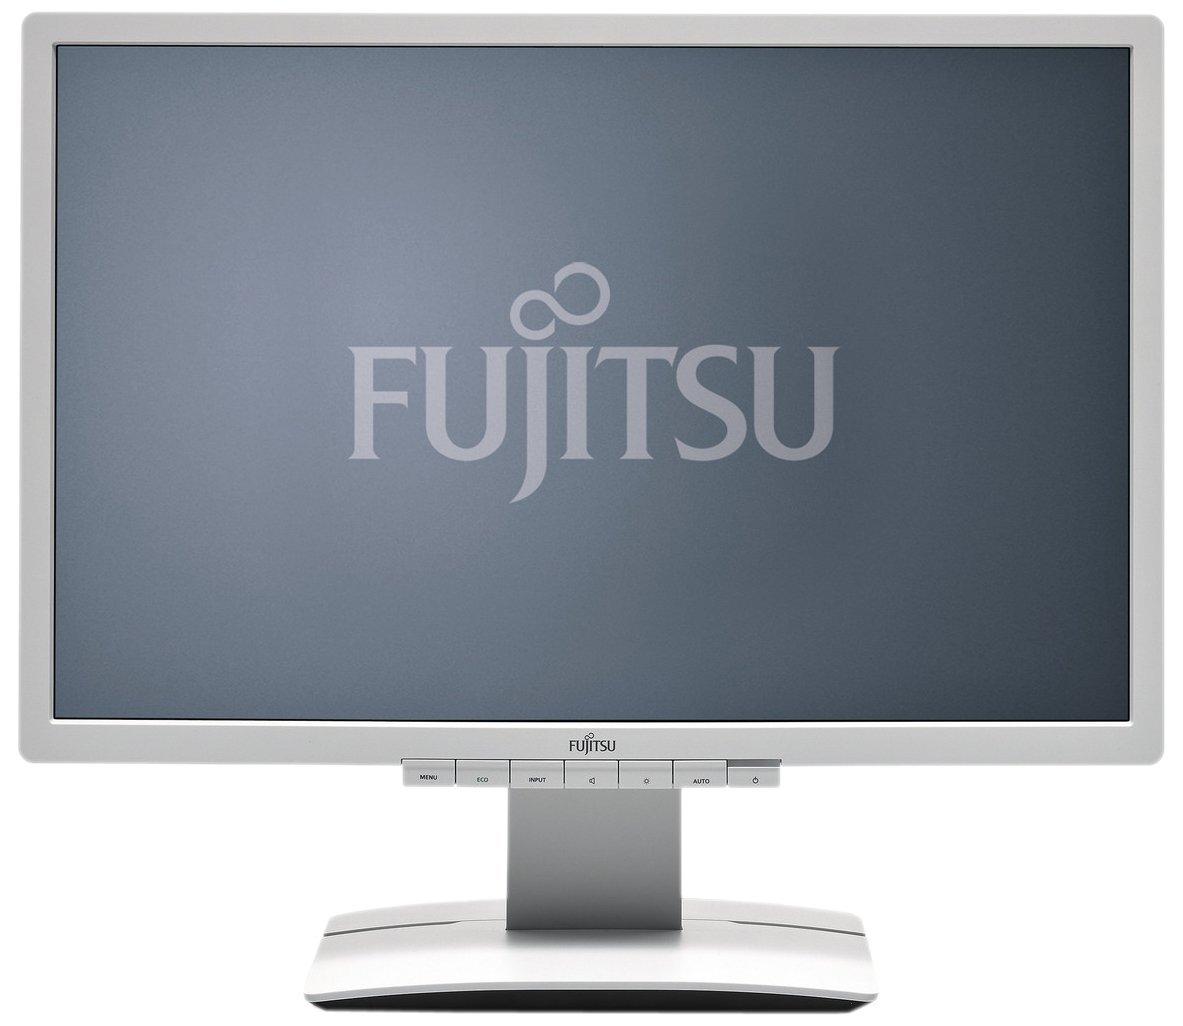 monitor fujitsu b22w 6 led 22 zoll 55 9cm 1680x1050 5ms. Black Bedroom Furniture Sets. Home Design Ideas